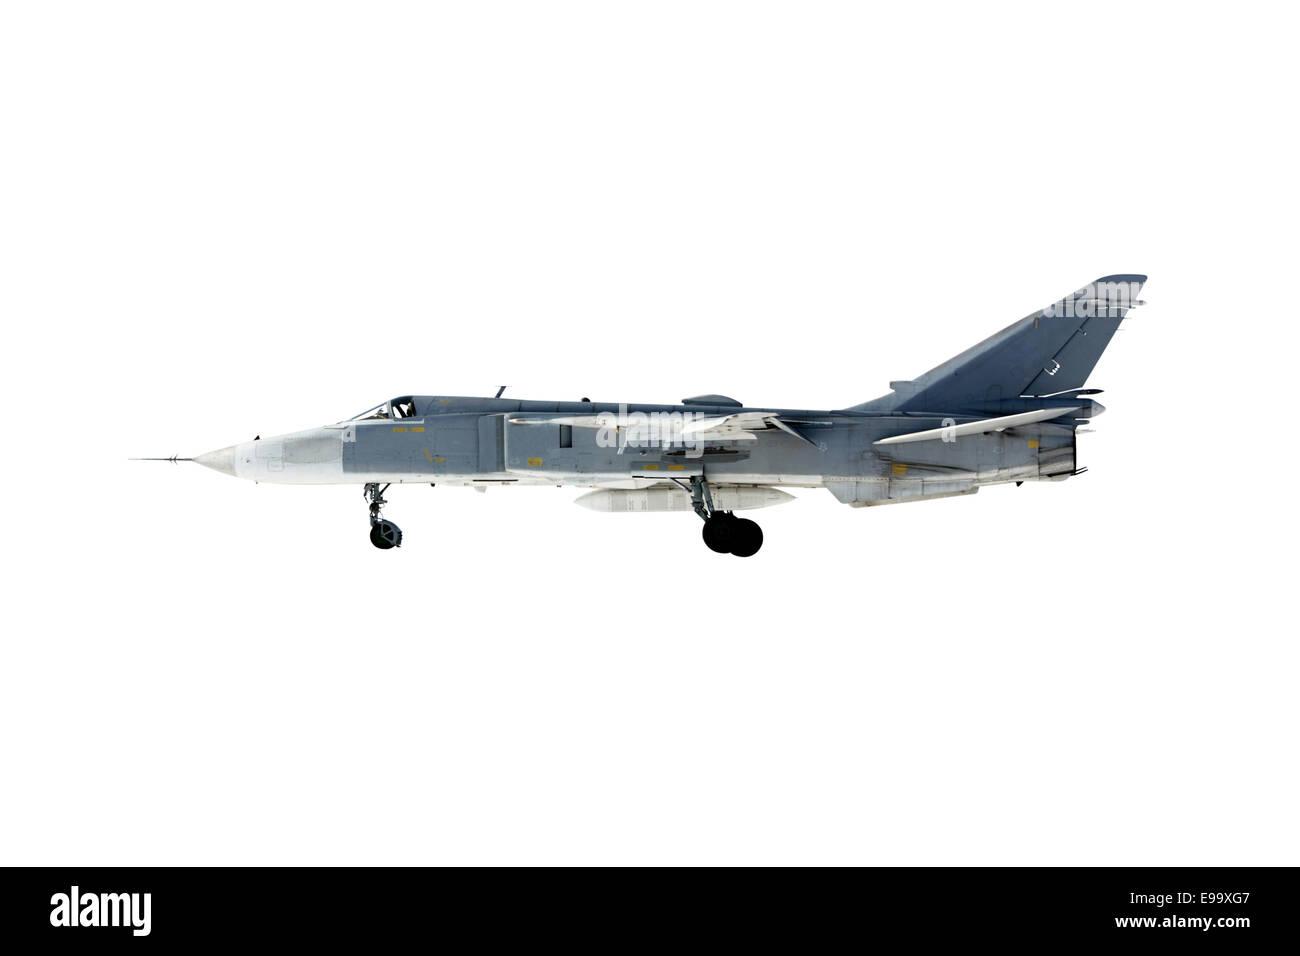 Su-24 Fencer - Stock Image